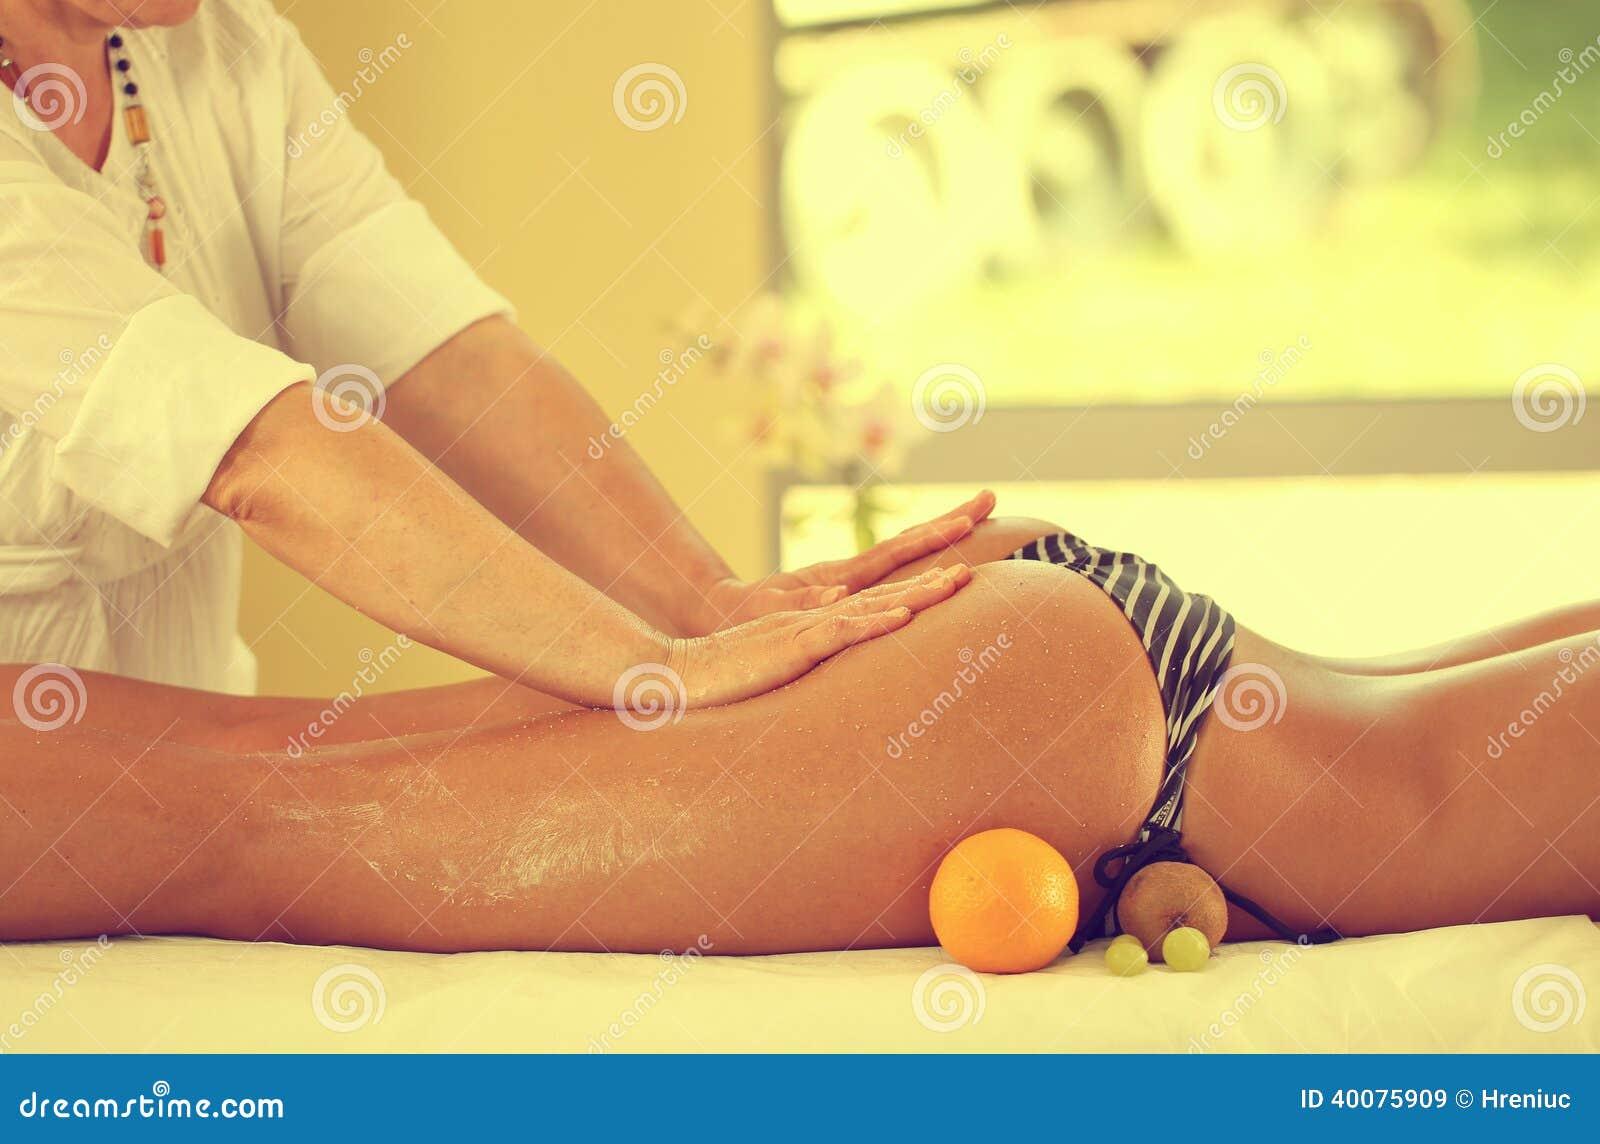 nalgas balmain erotic massage